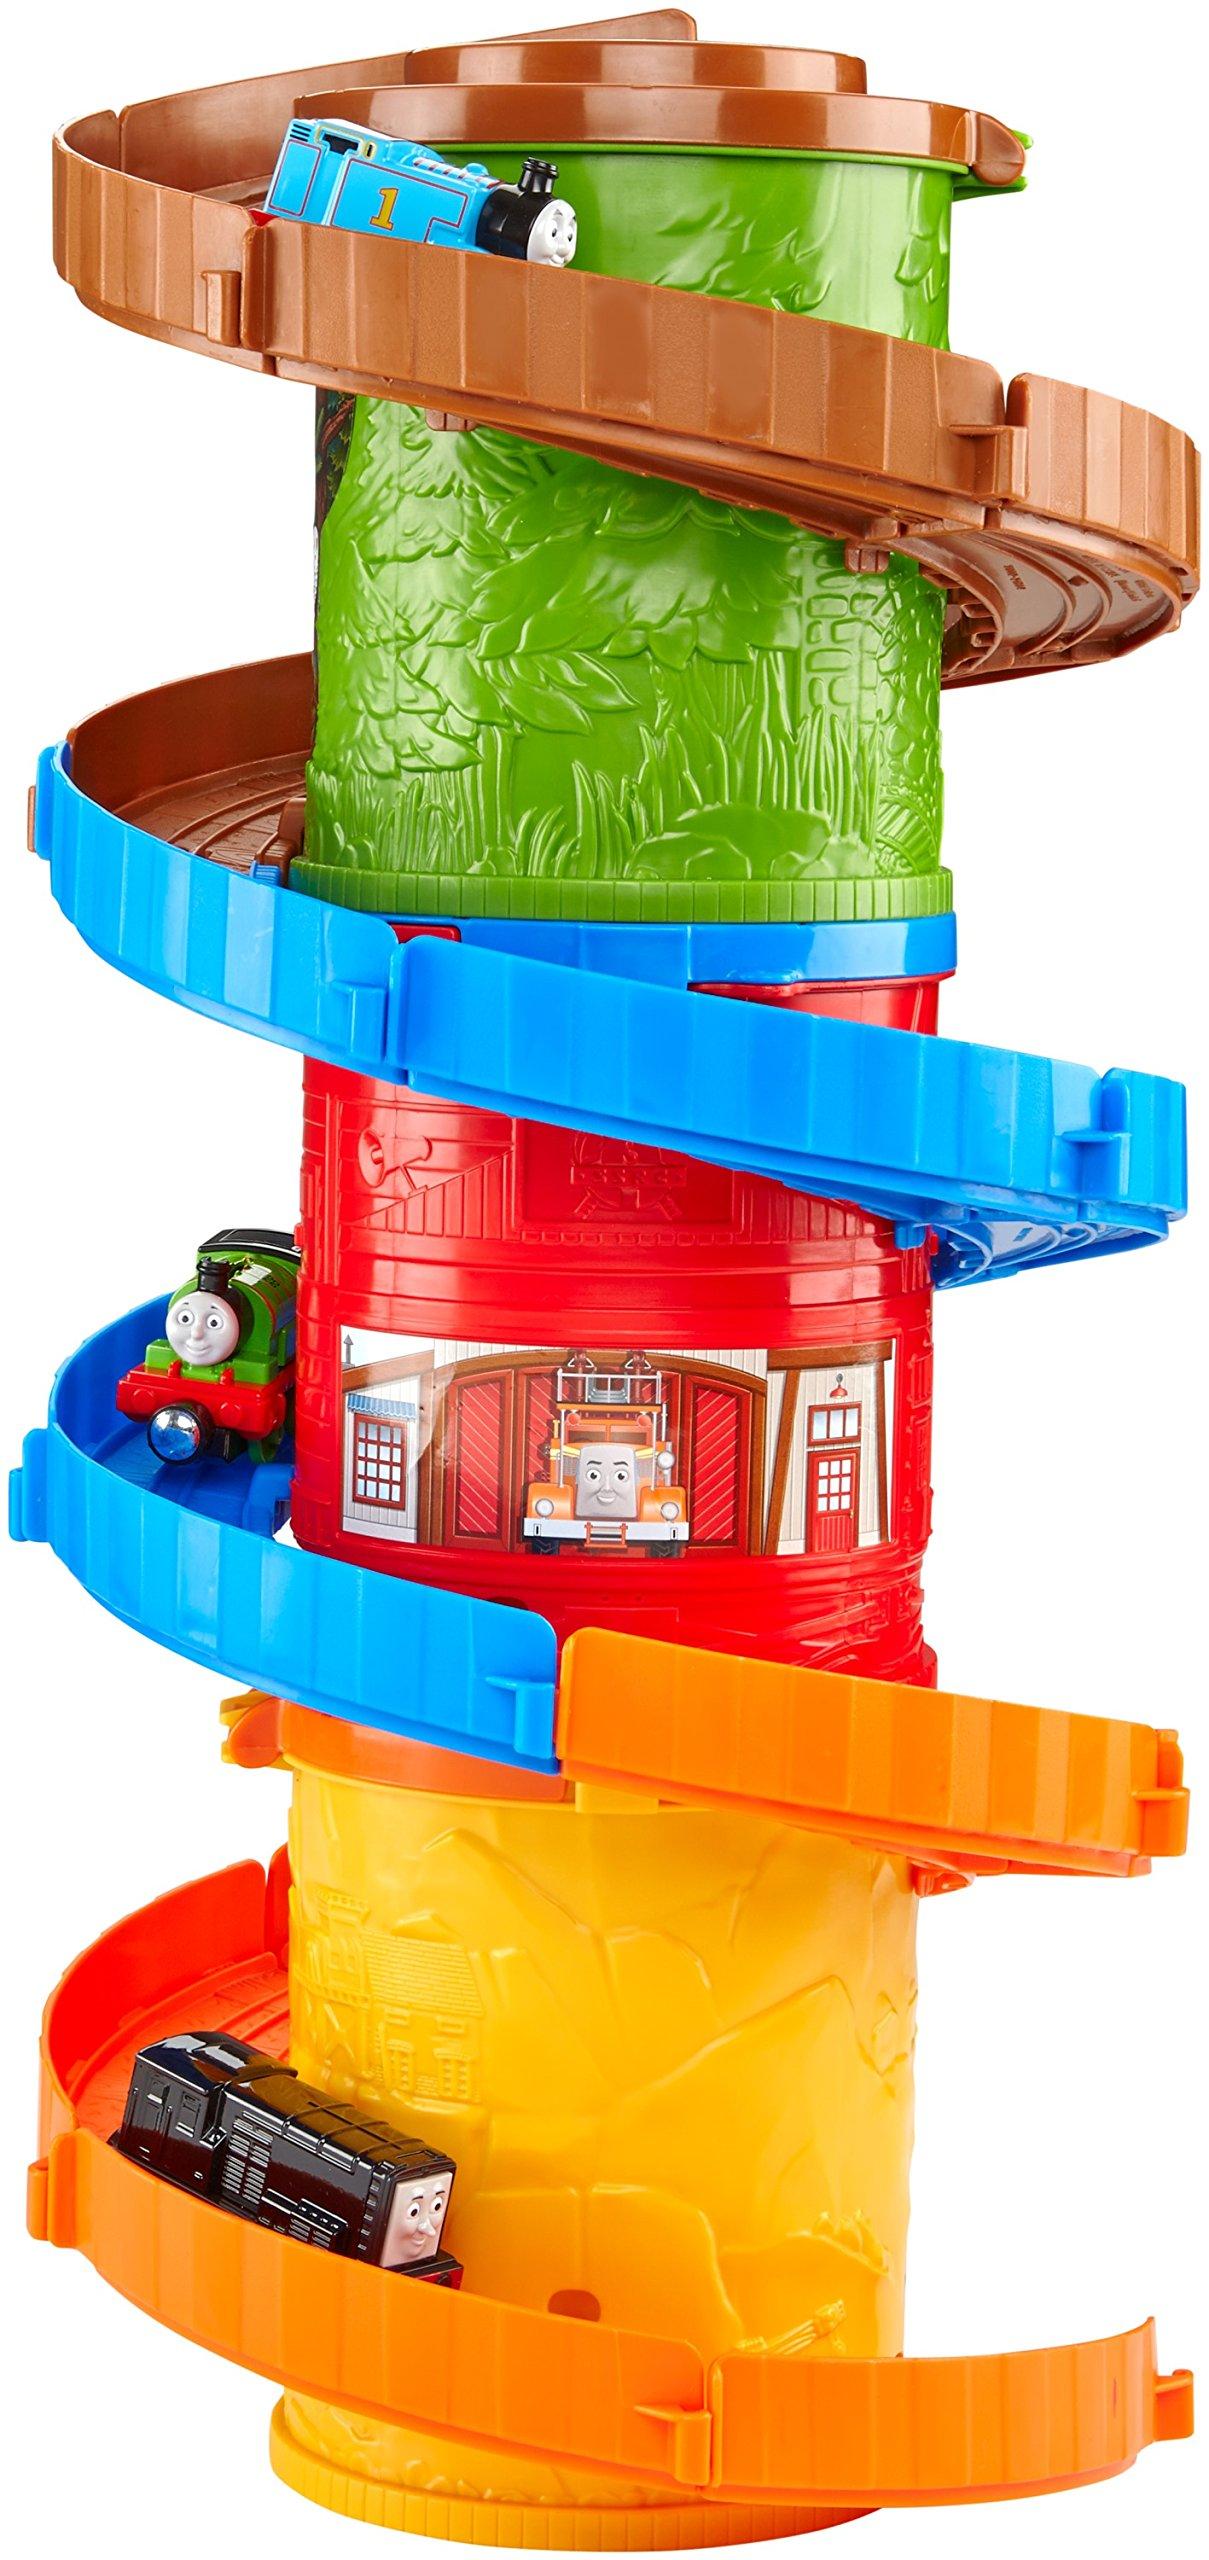 Fisher-Price Thomas & Friends Take-n-Play, Spiral Tower Tracks Mega Set